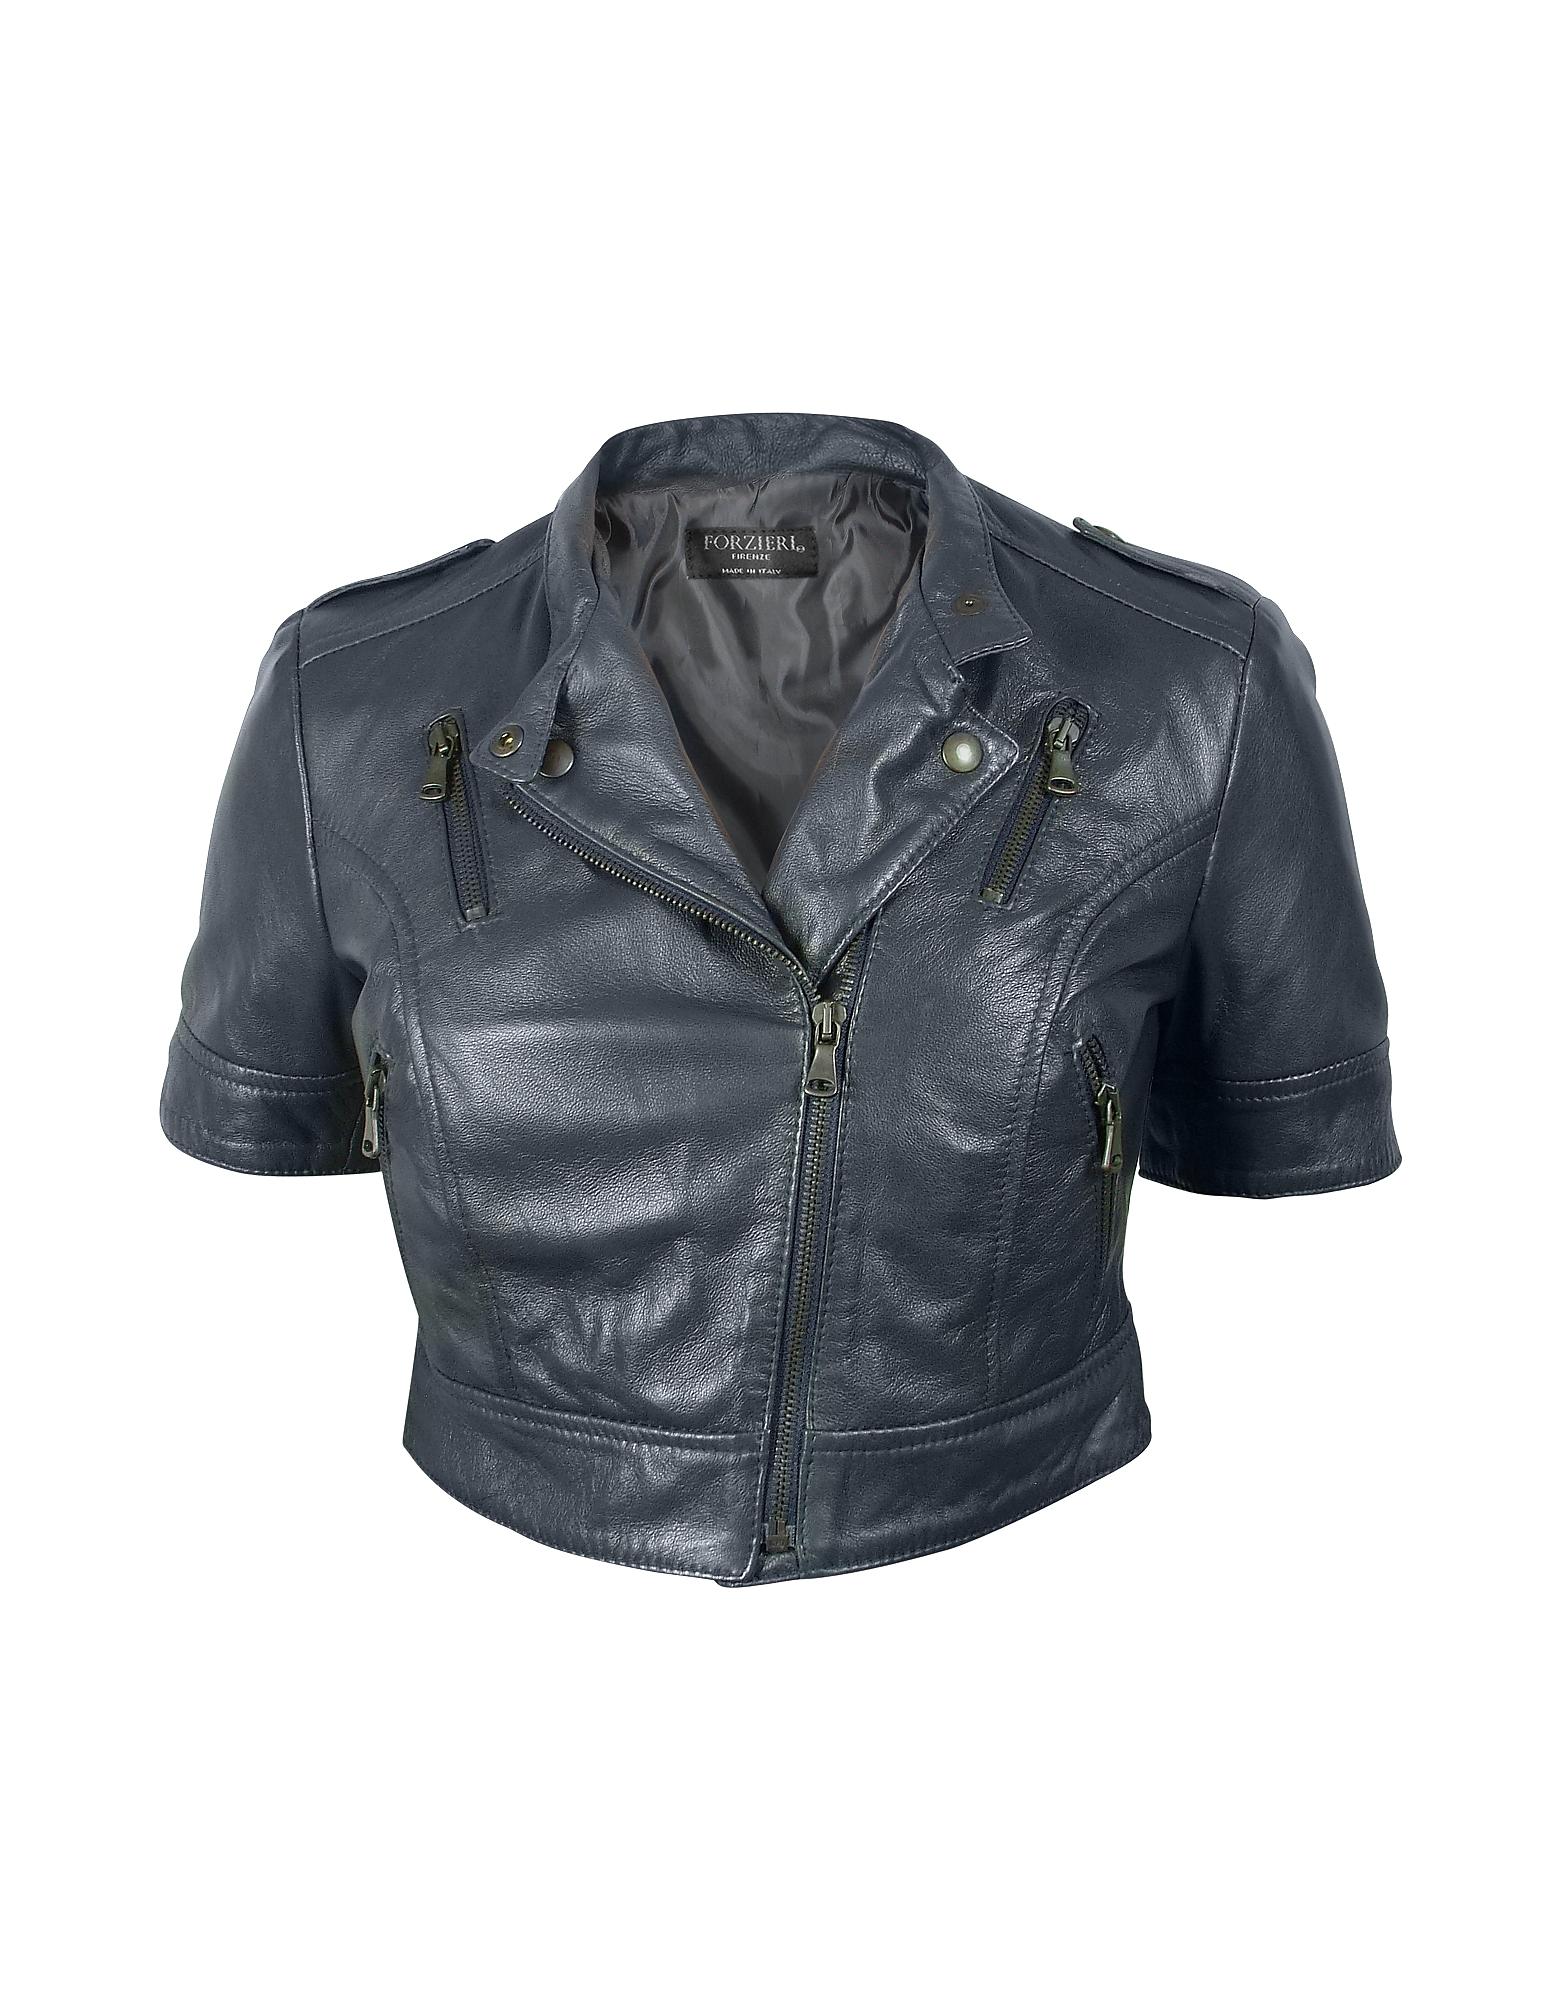 Синяя Укороченная Куртка в Мото Стиле